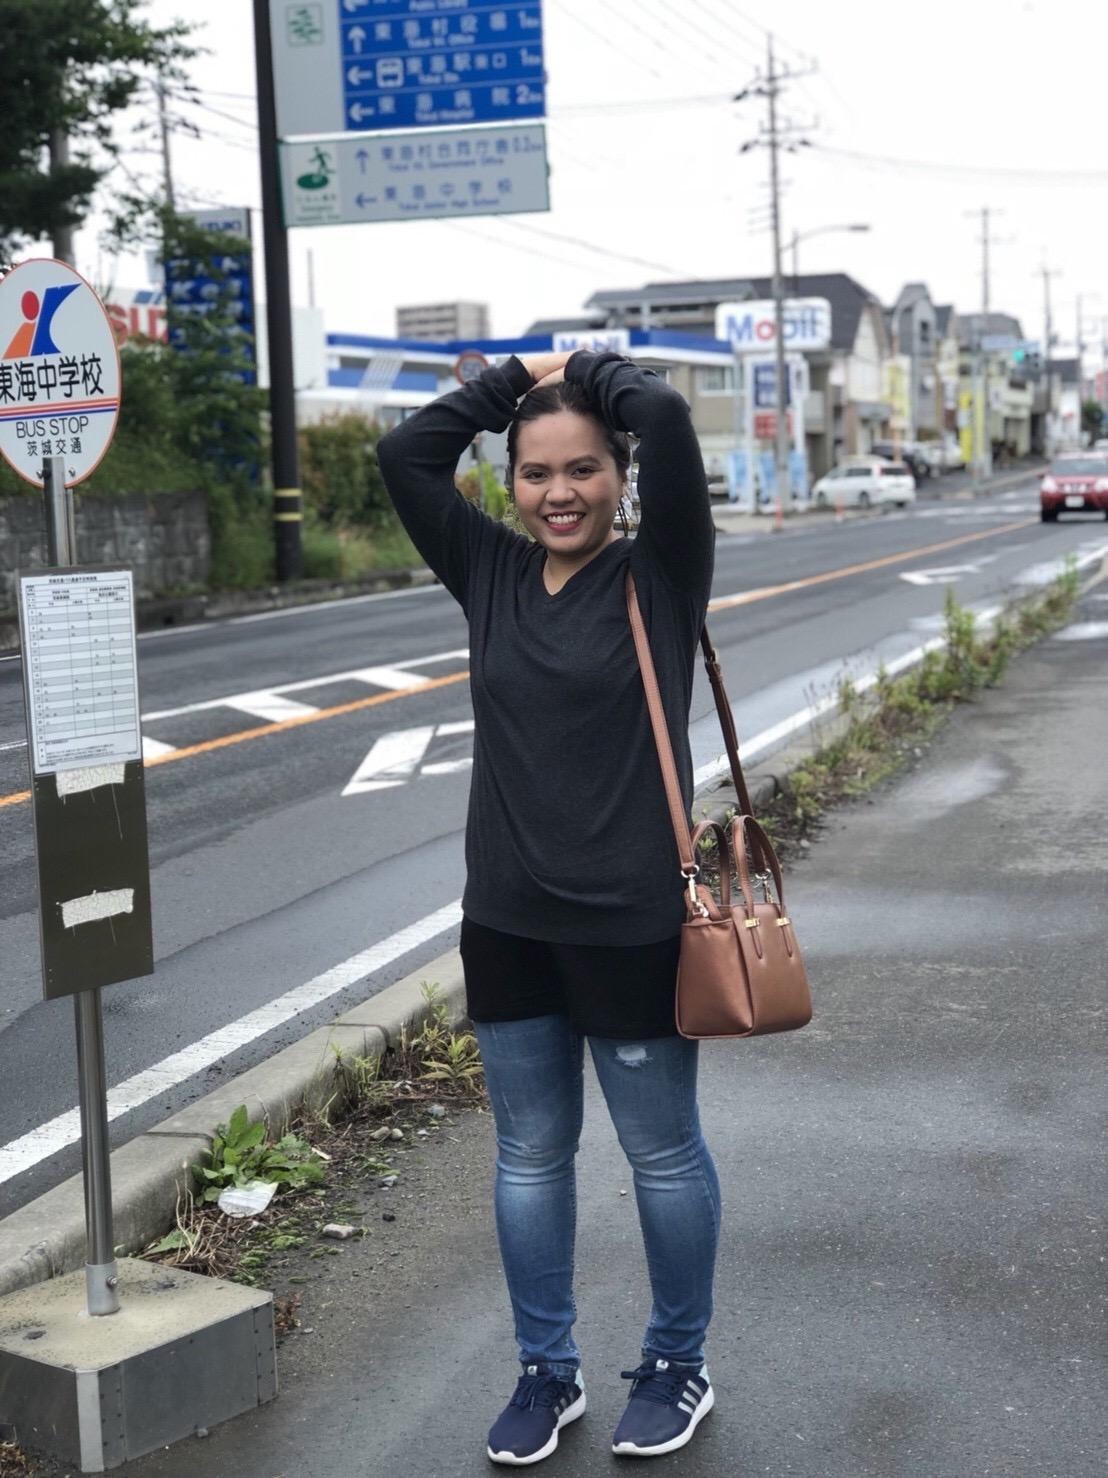 Celotehan Suami Istri (CSI): #12. Drama HujanDadakan